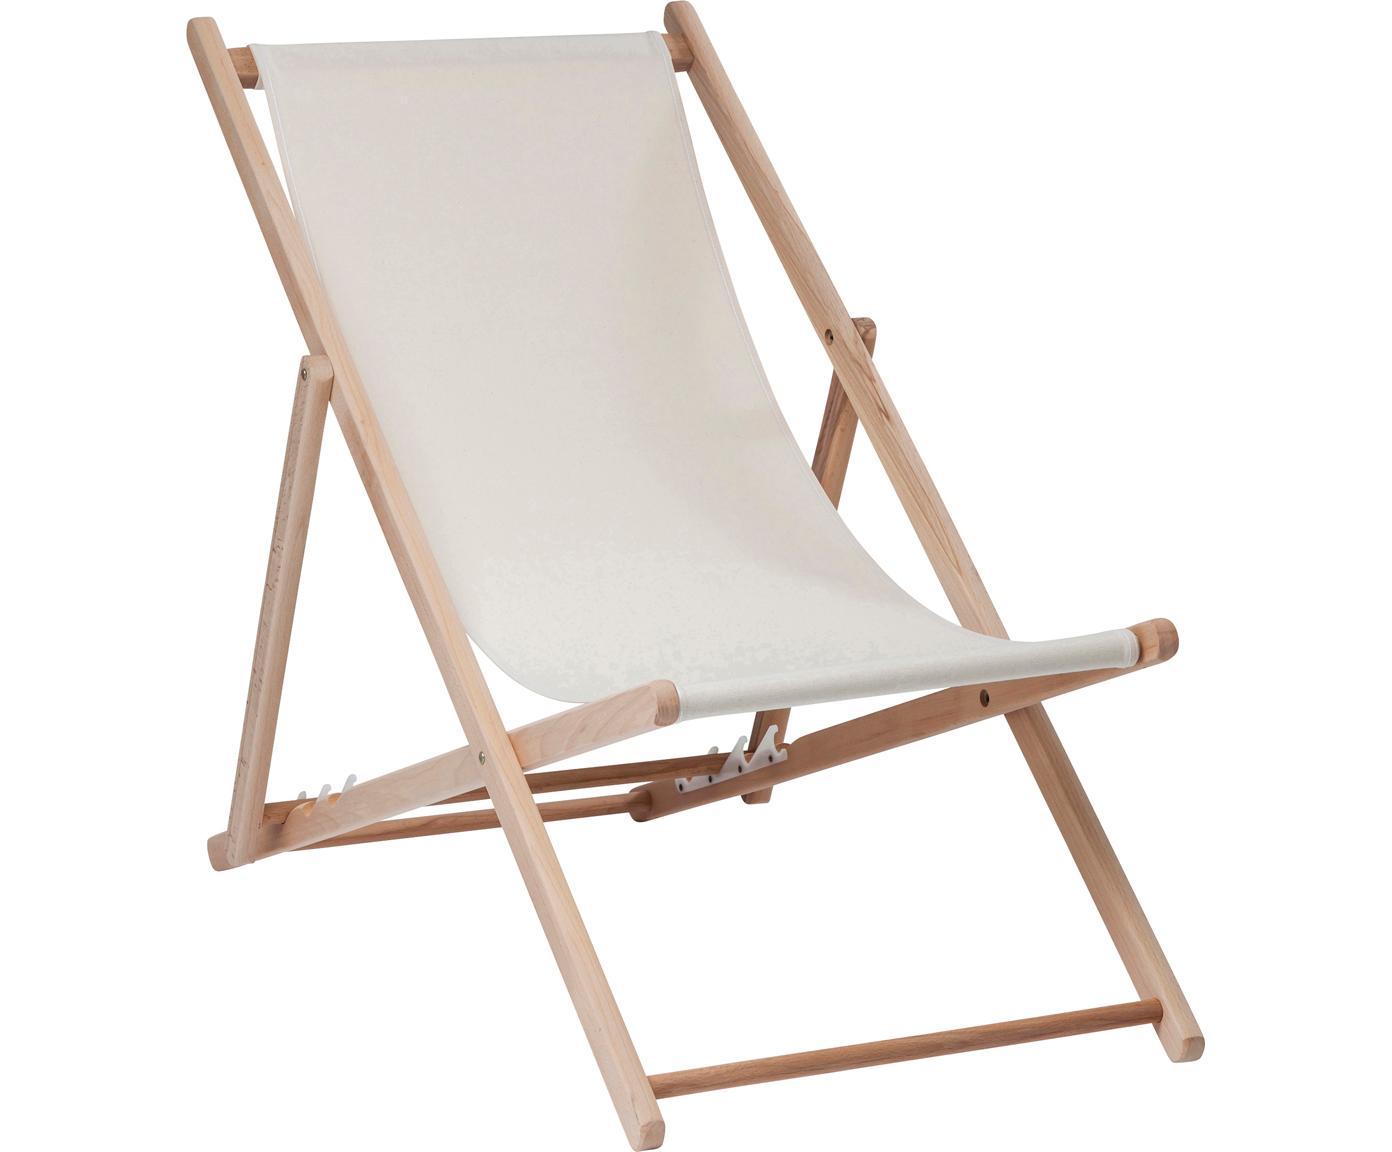 Tumbona plegable Hot Summer, Estructura: madera de haya, Beige, haya, An 96 x F 56 cm